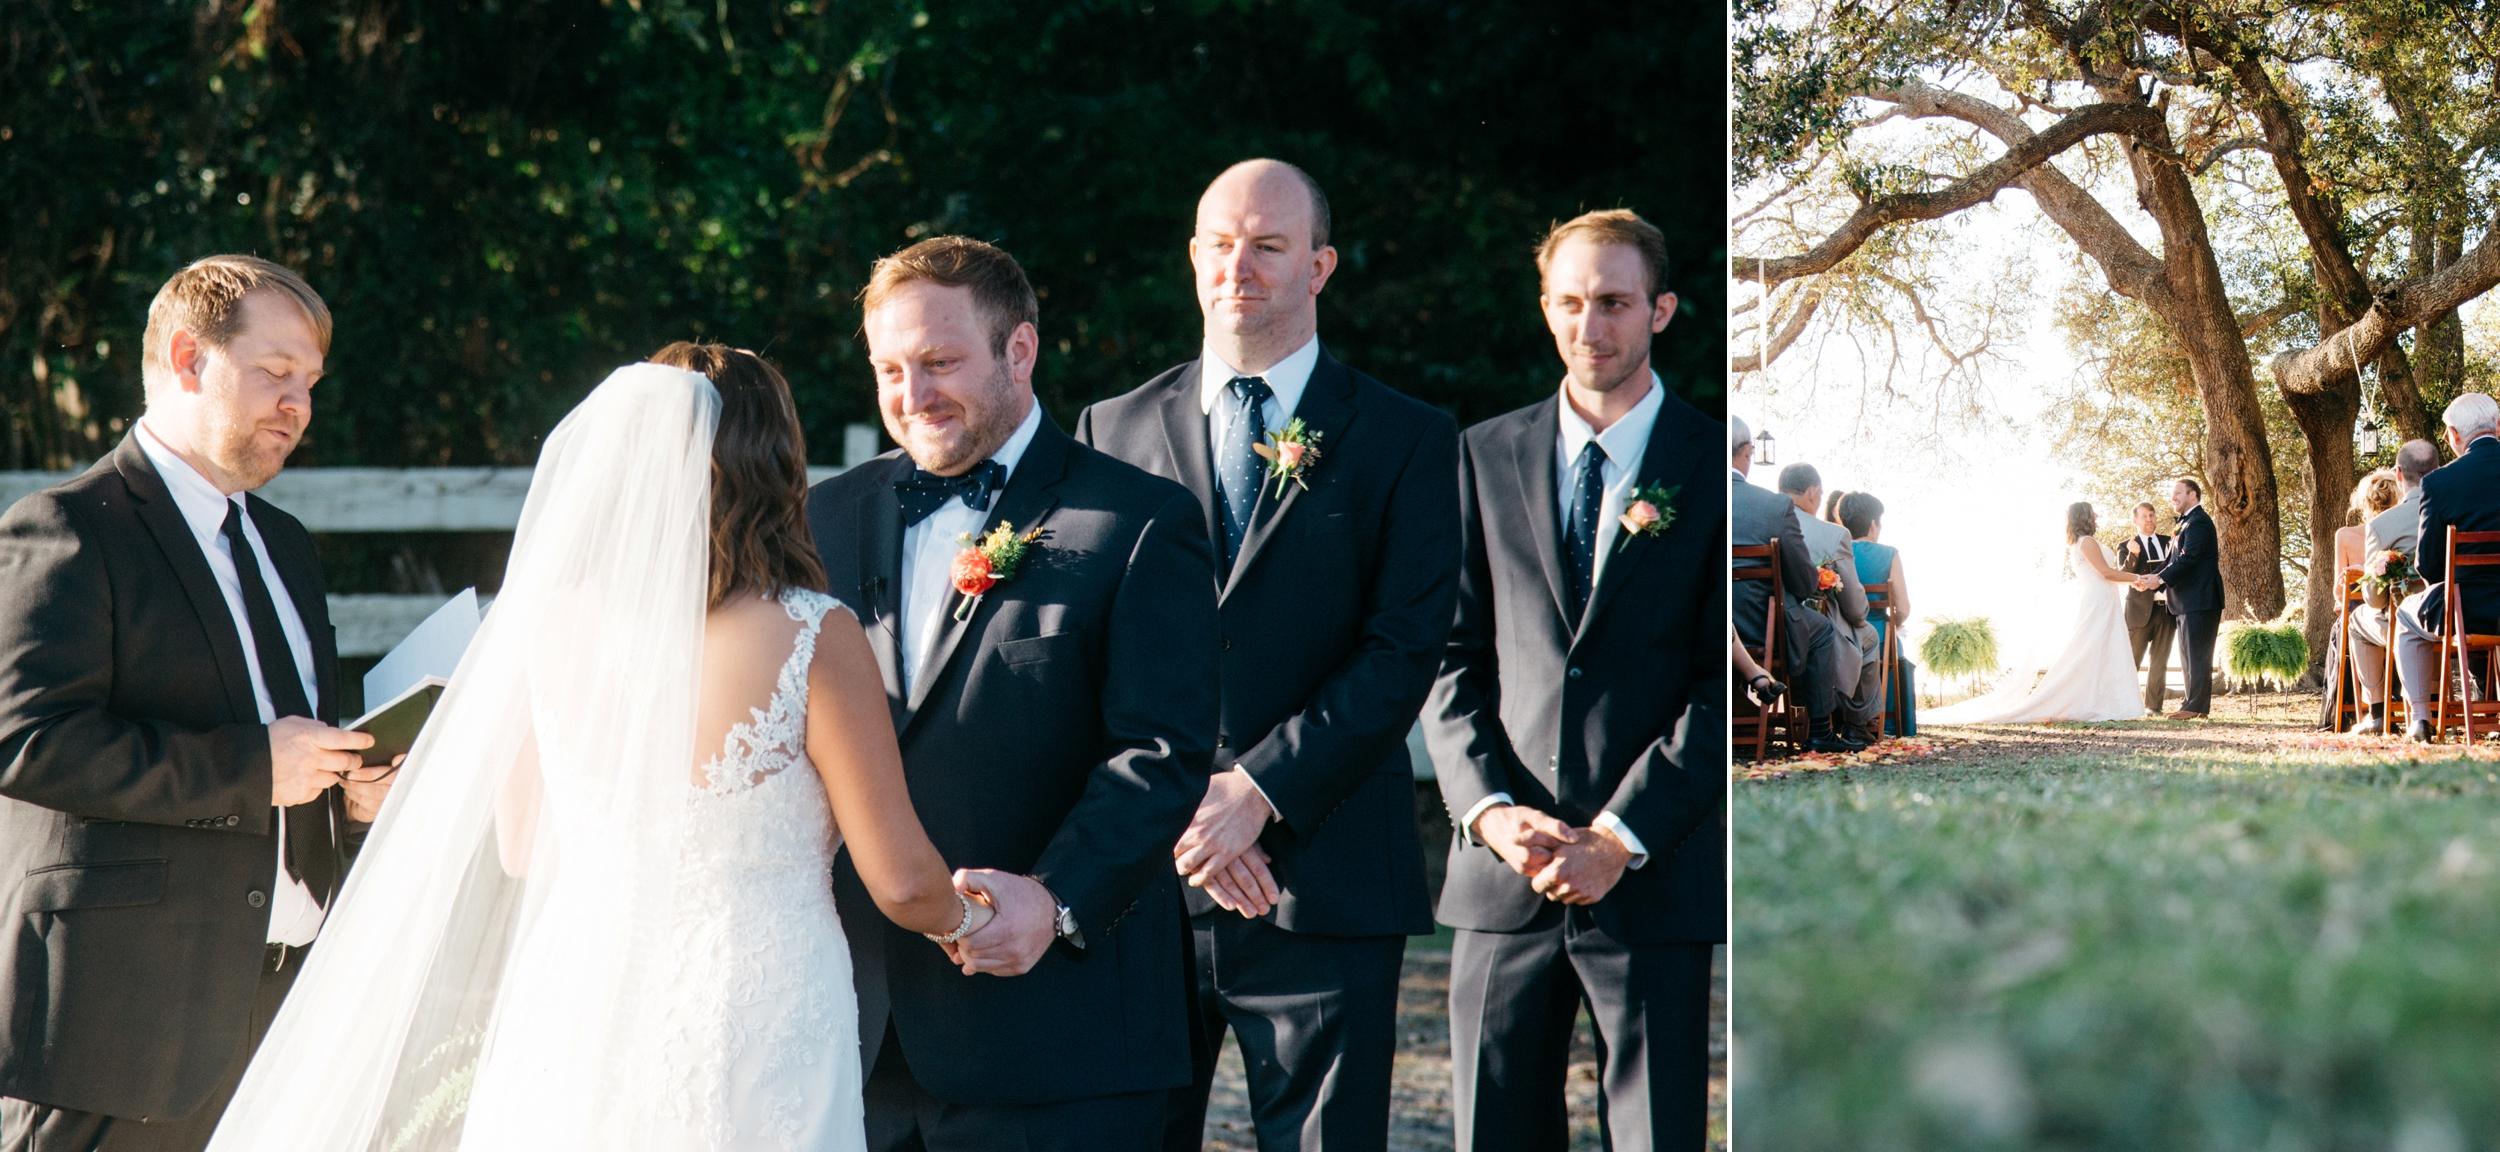 Charleston-wedding-photographer-67.jpg